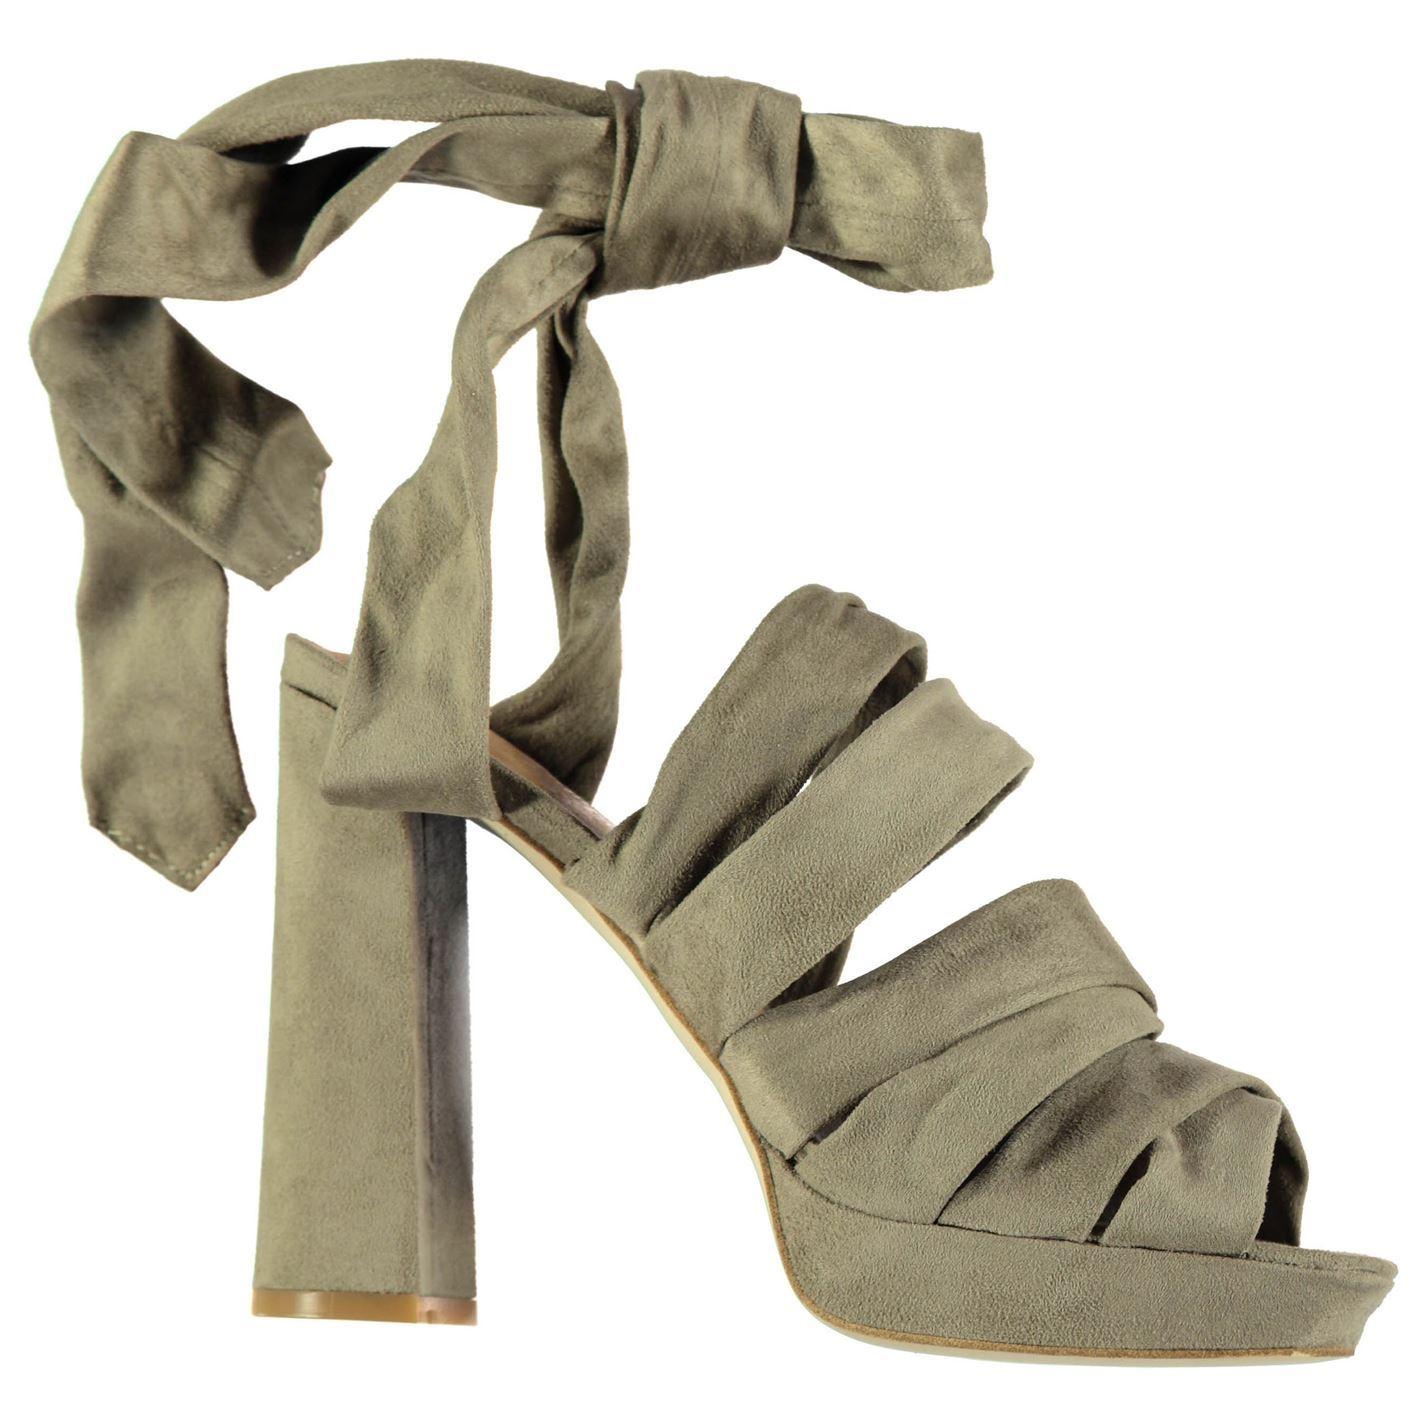 Beige Fashion Heel Footwear Shoes Jeffrey Campbell Womens High Sandal Chantae 8qt0wZtp